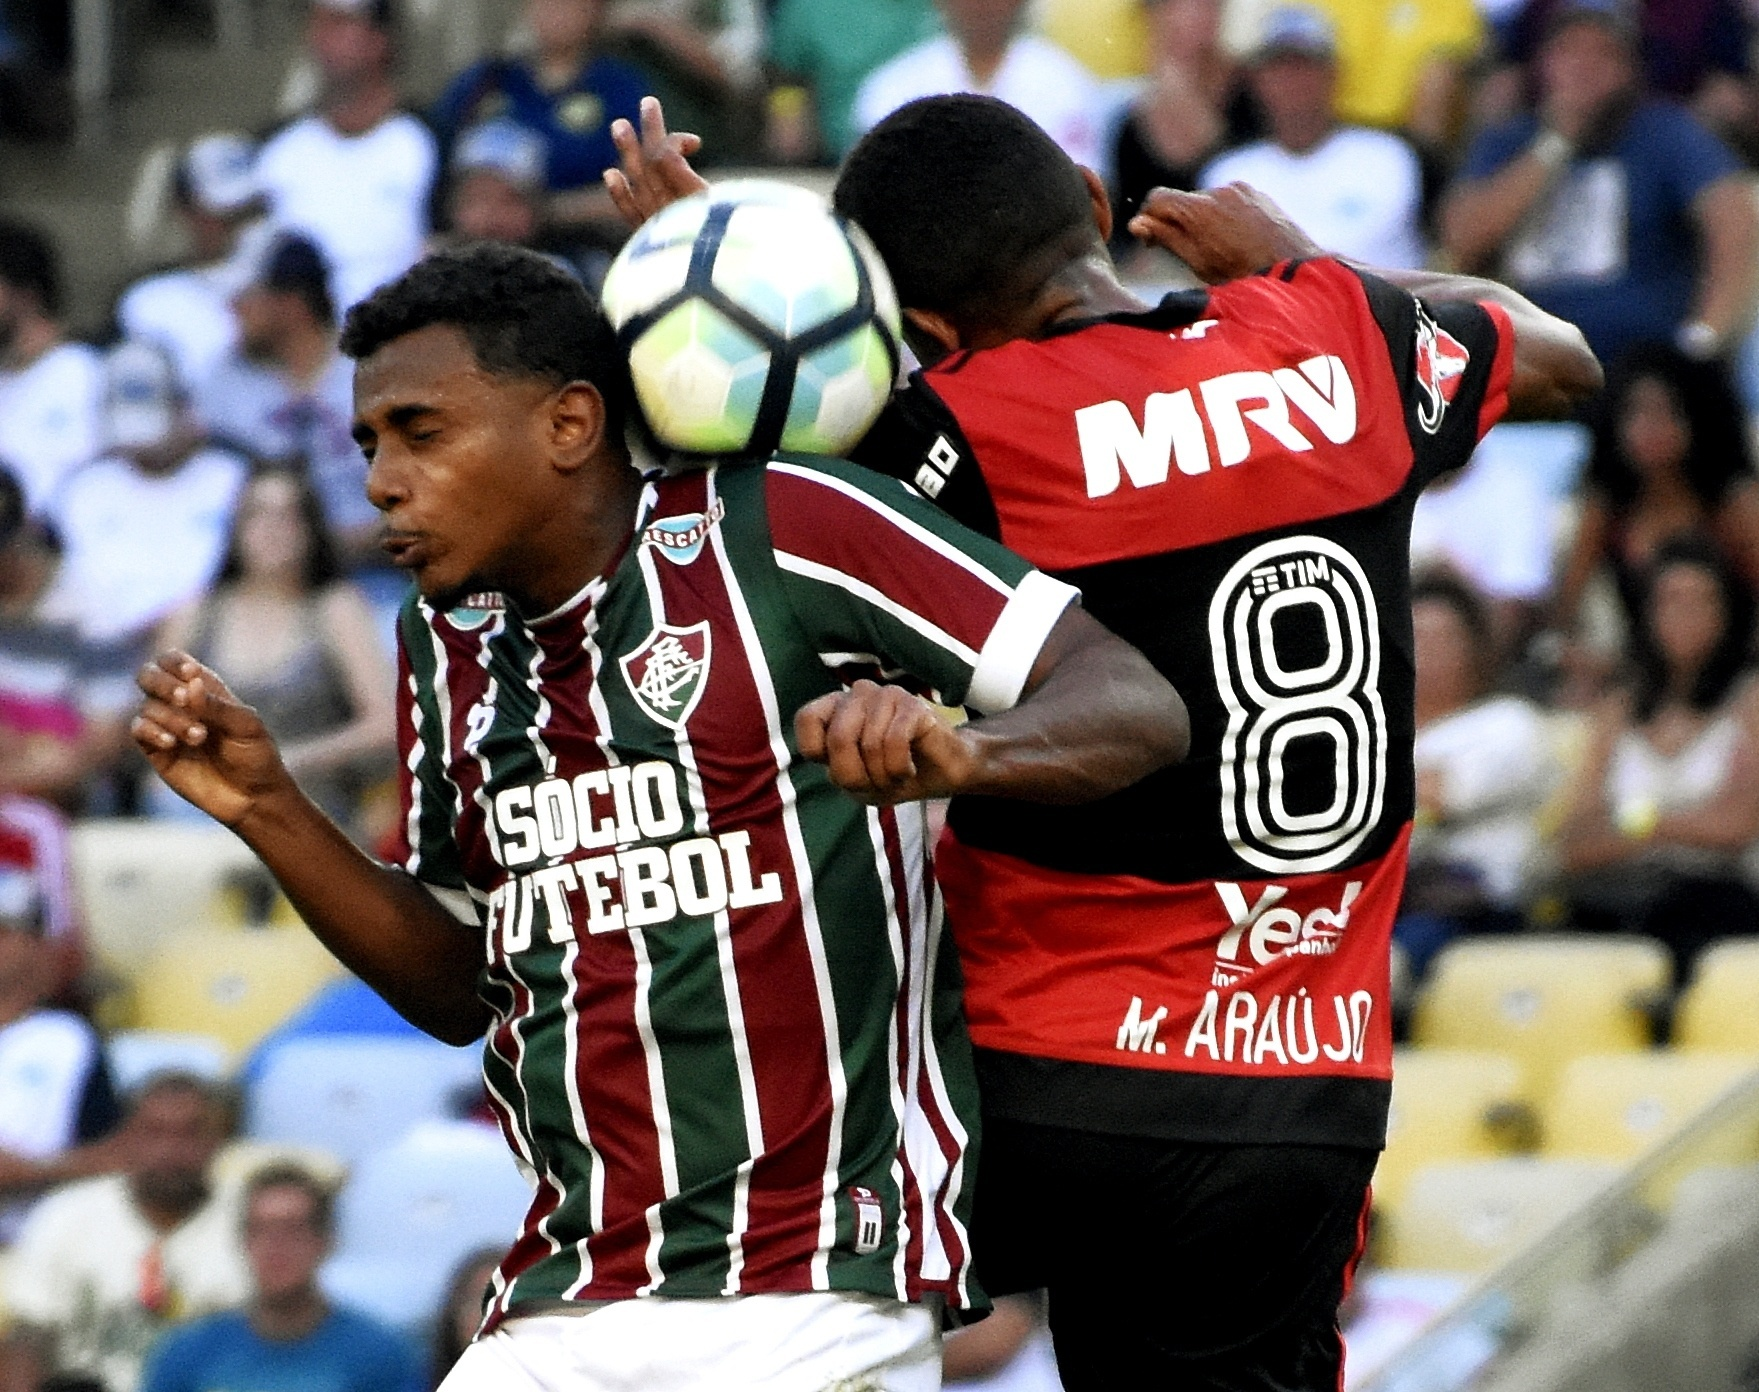 Wendel e Márcio Araújo disputam bola no jogo Fluminense x Flamengo pelo Campeonato Brasileiro 2017